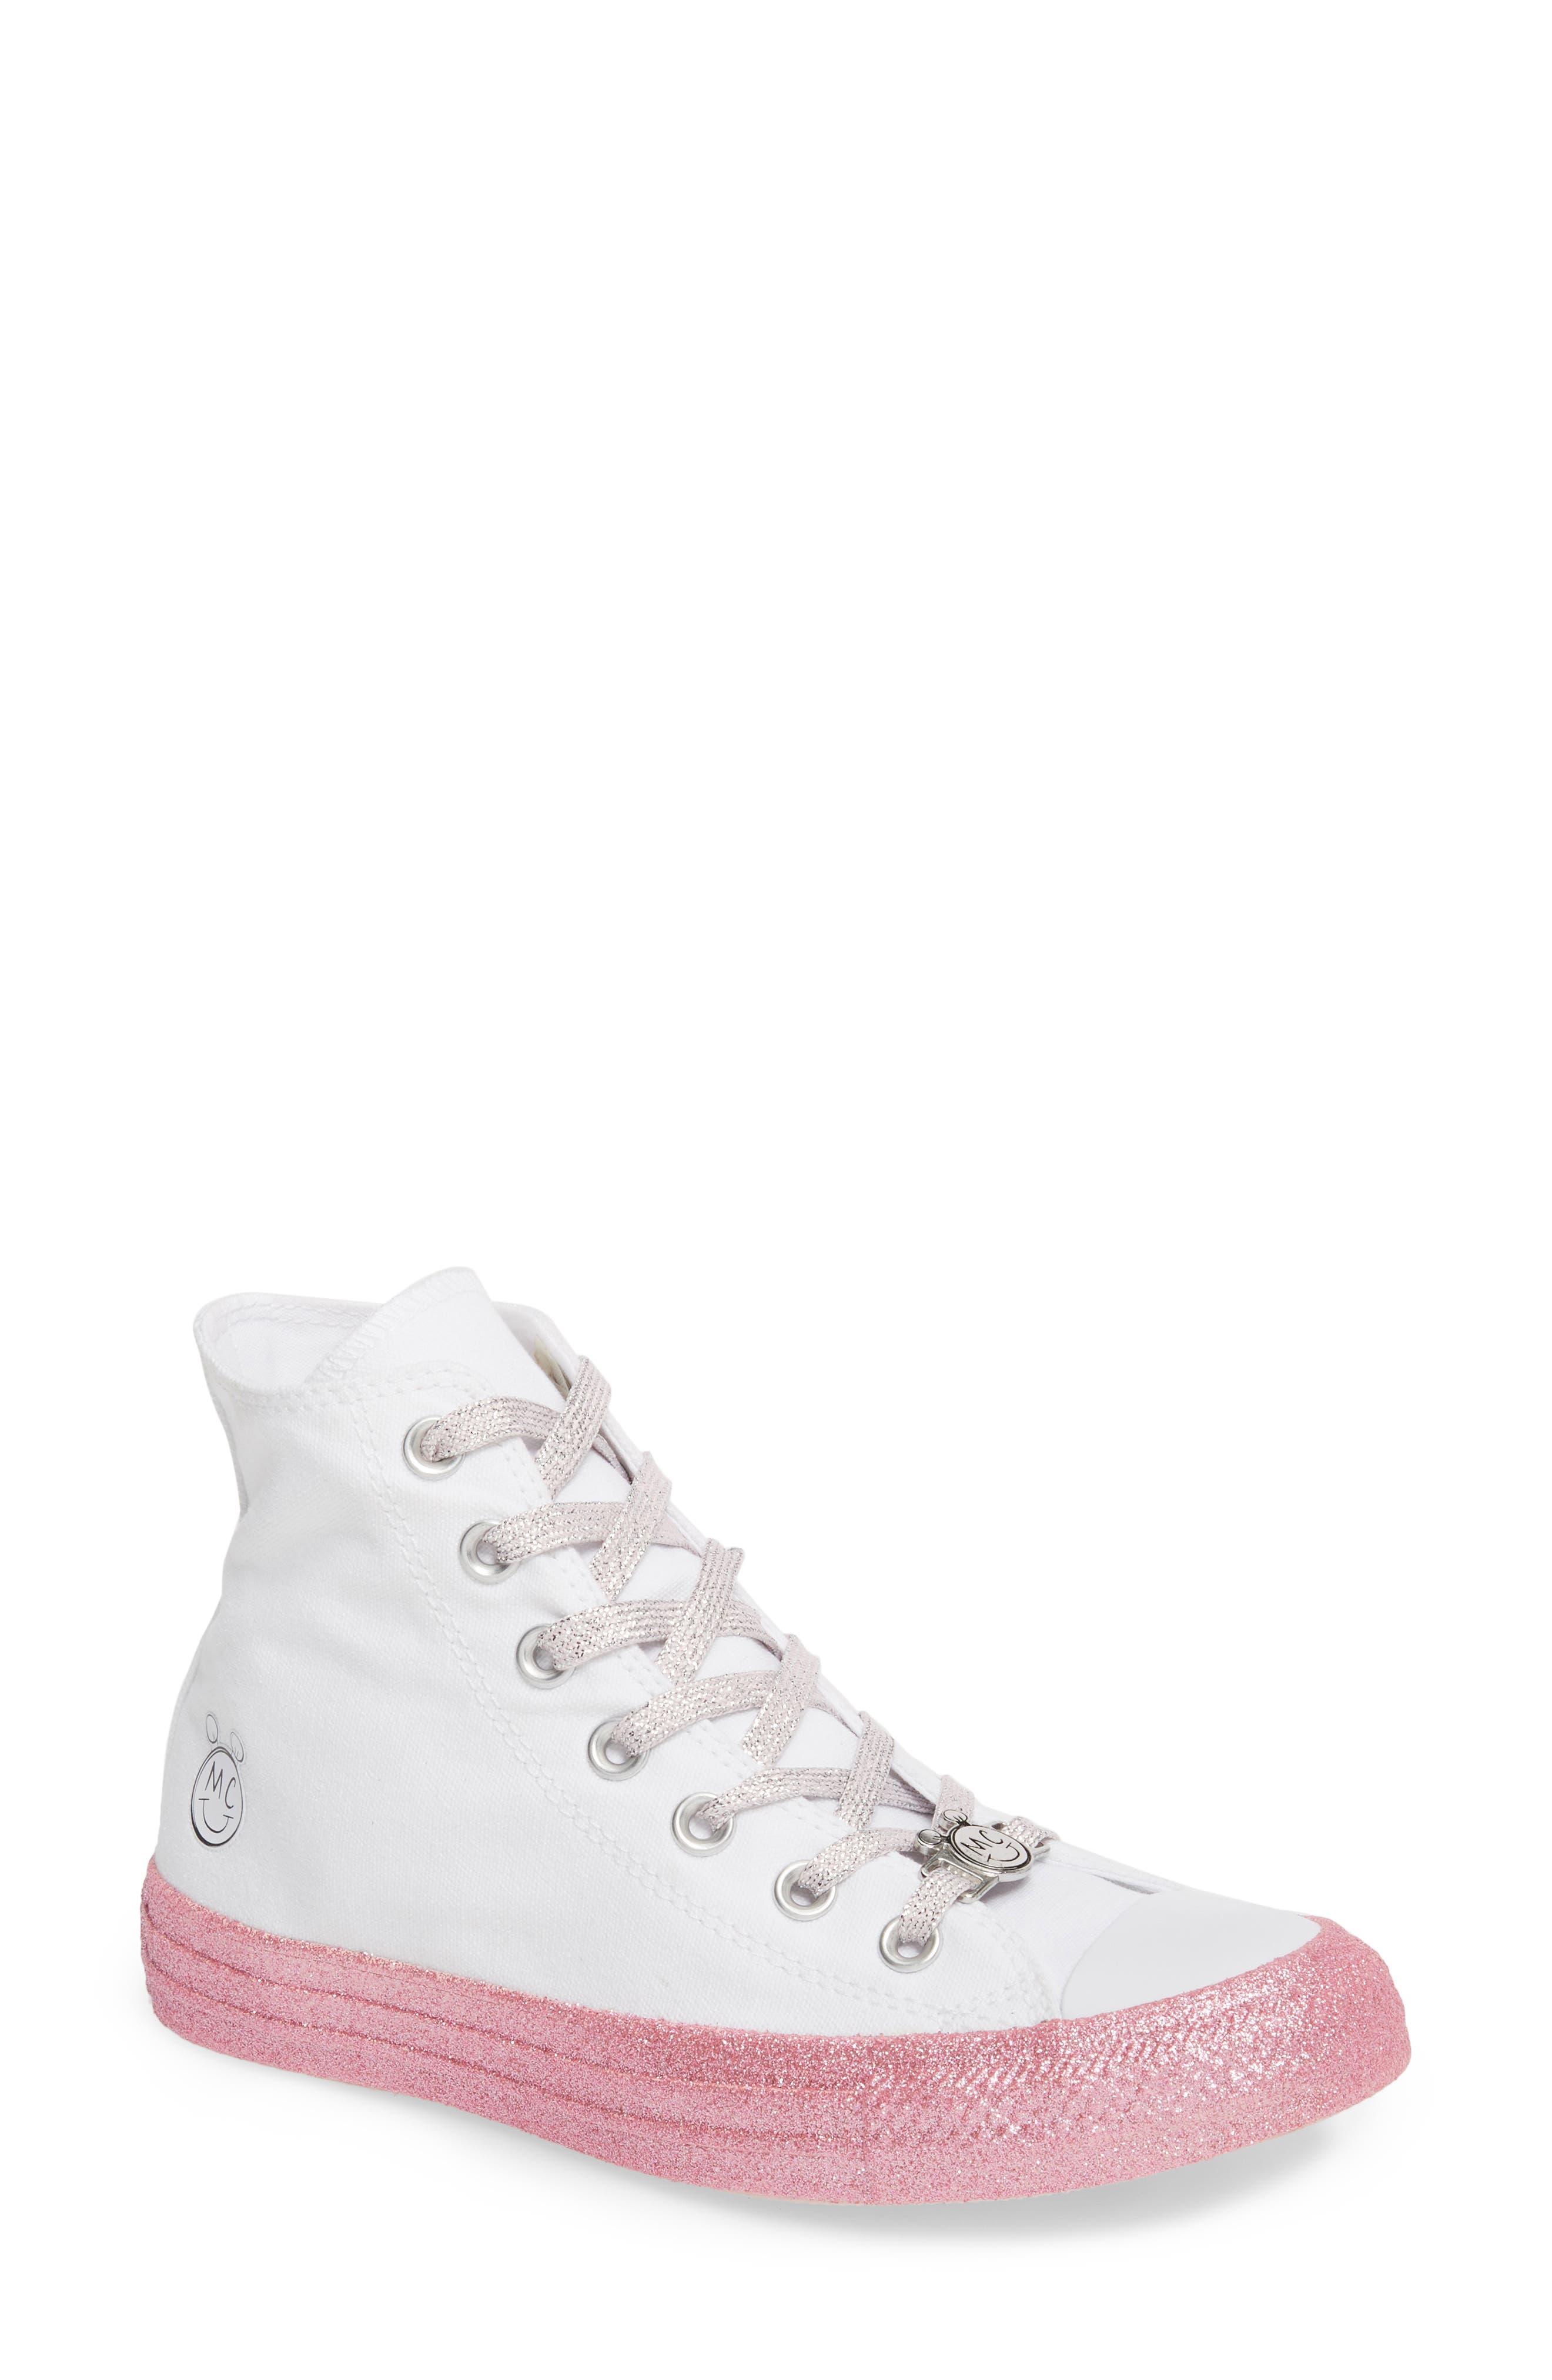 Converse x Miley Cyrus Chuck Taylor All Star Glitter High Top Sneaker (Women)